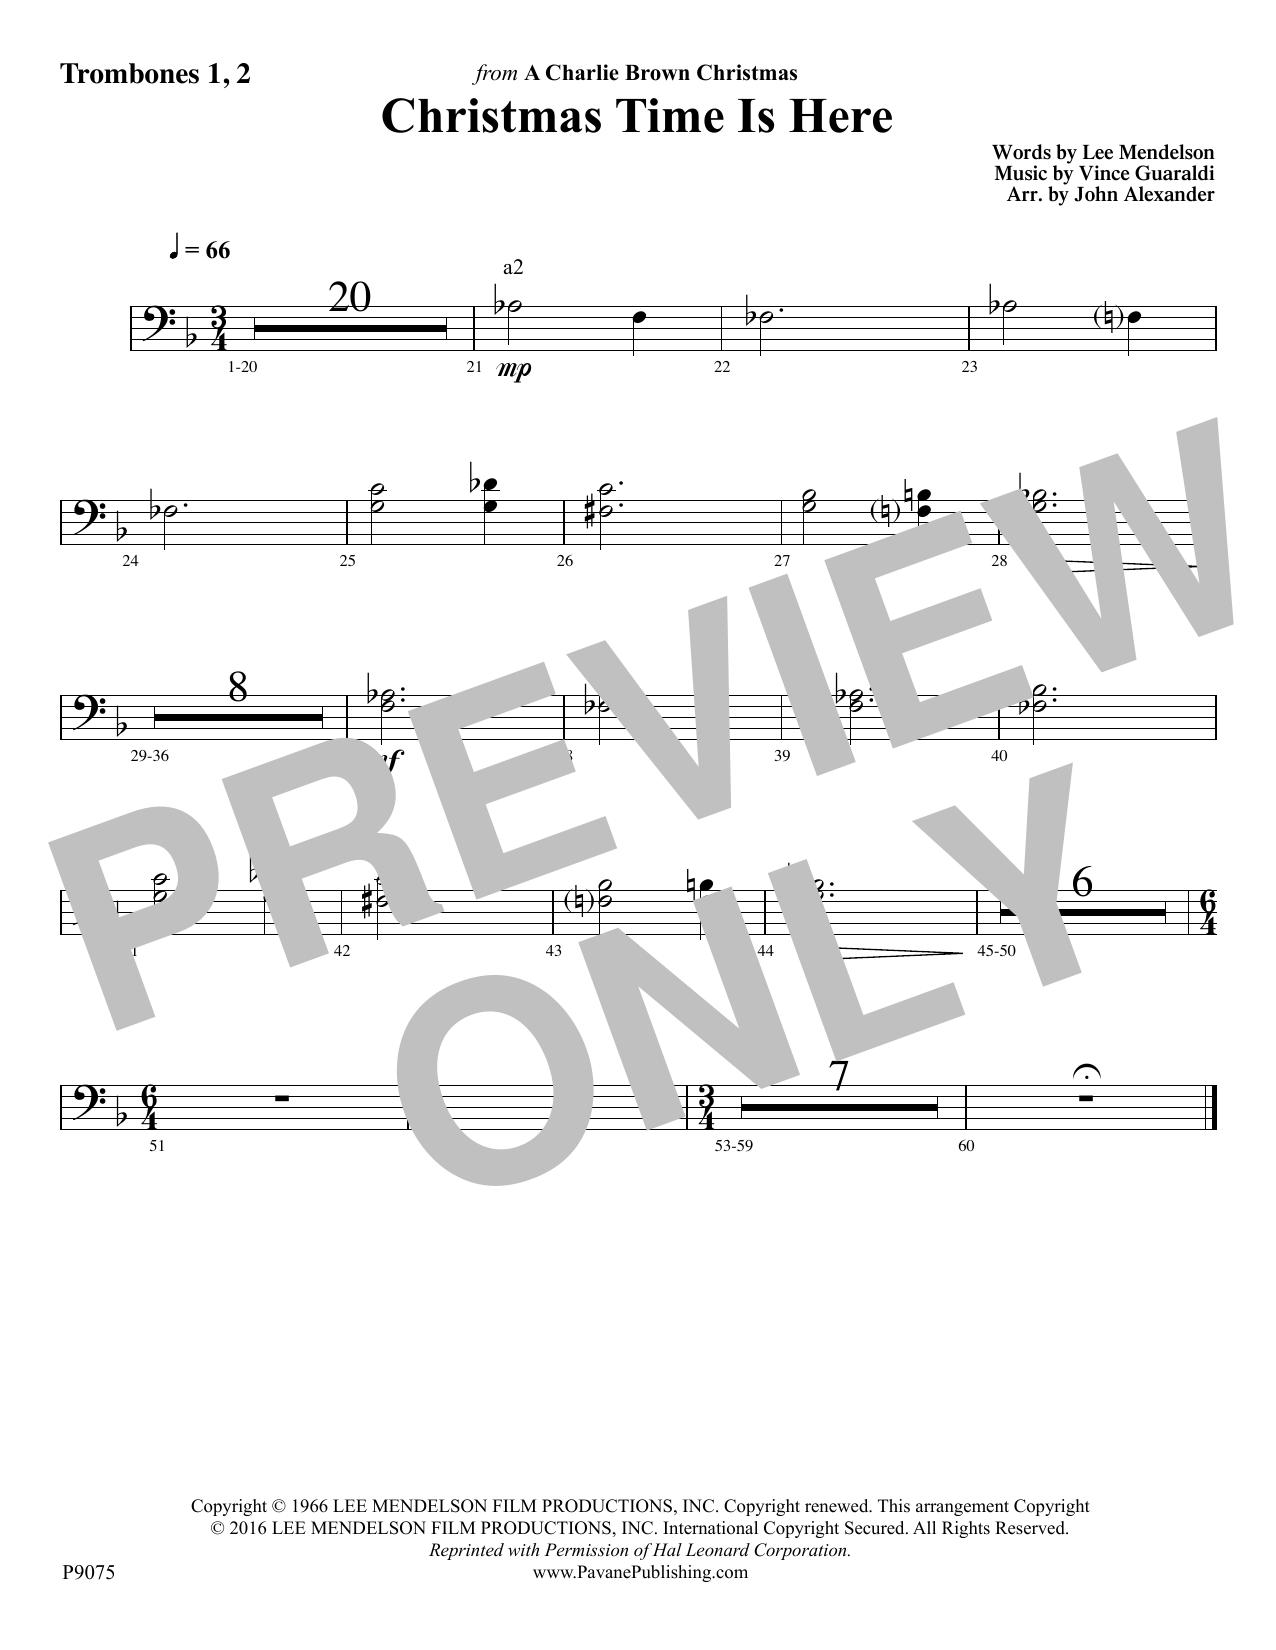 Christmas Time Is Here - Trombone 1, 2 Sheet Music